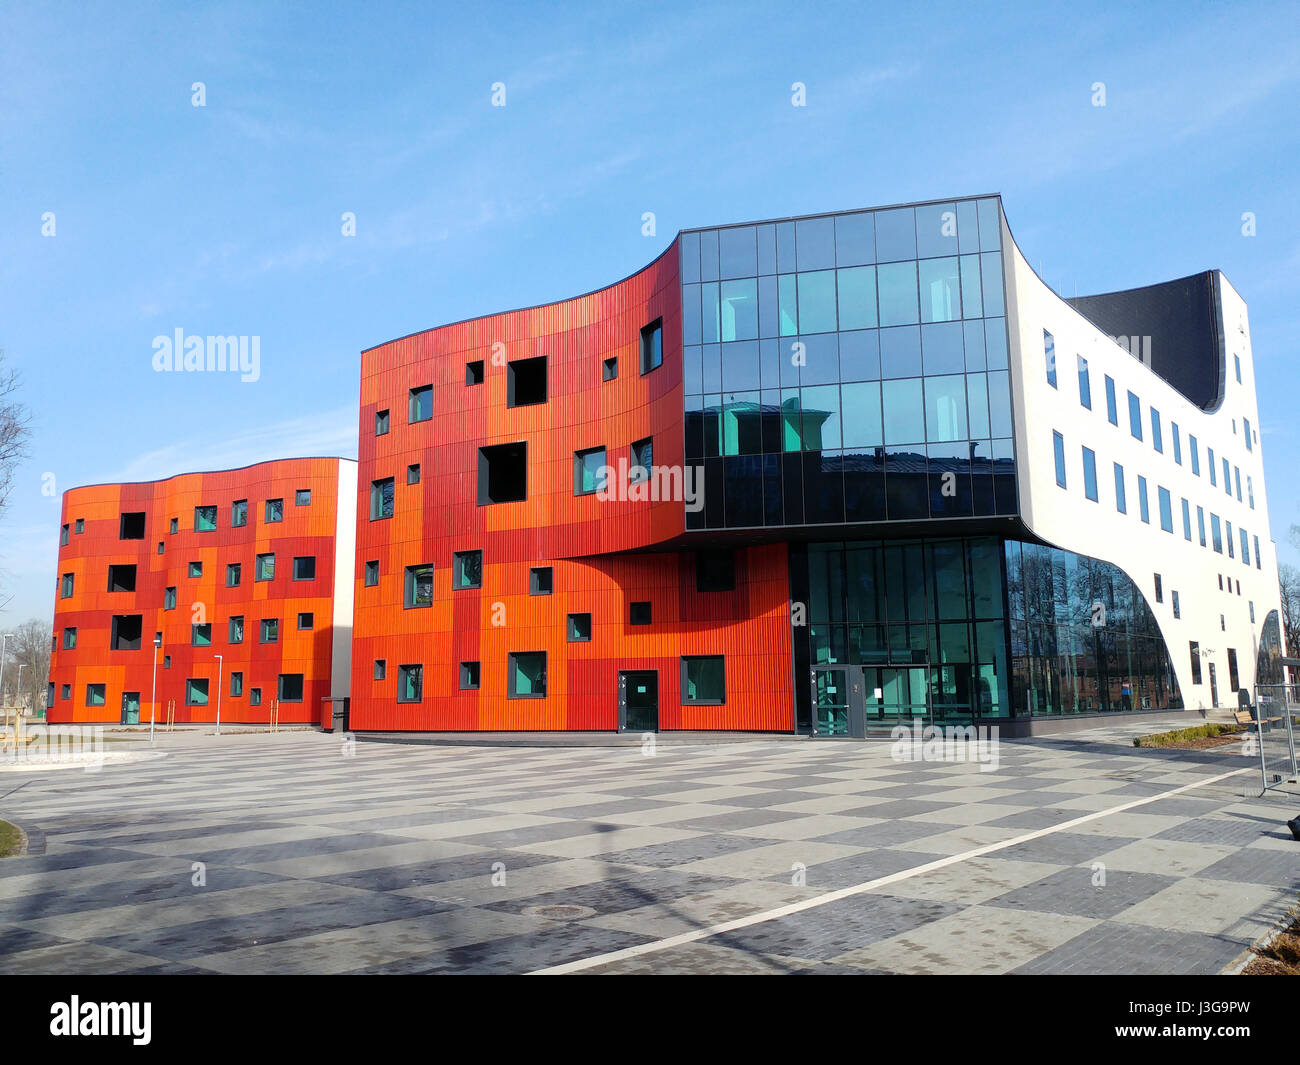 Pauls Stradins Clinical University Hospital, New Block A. April 28,2017. Leading multi-functional university hospital - Stock Image